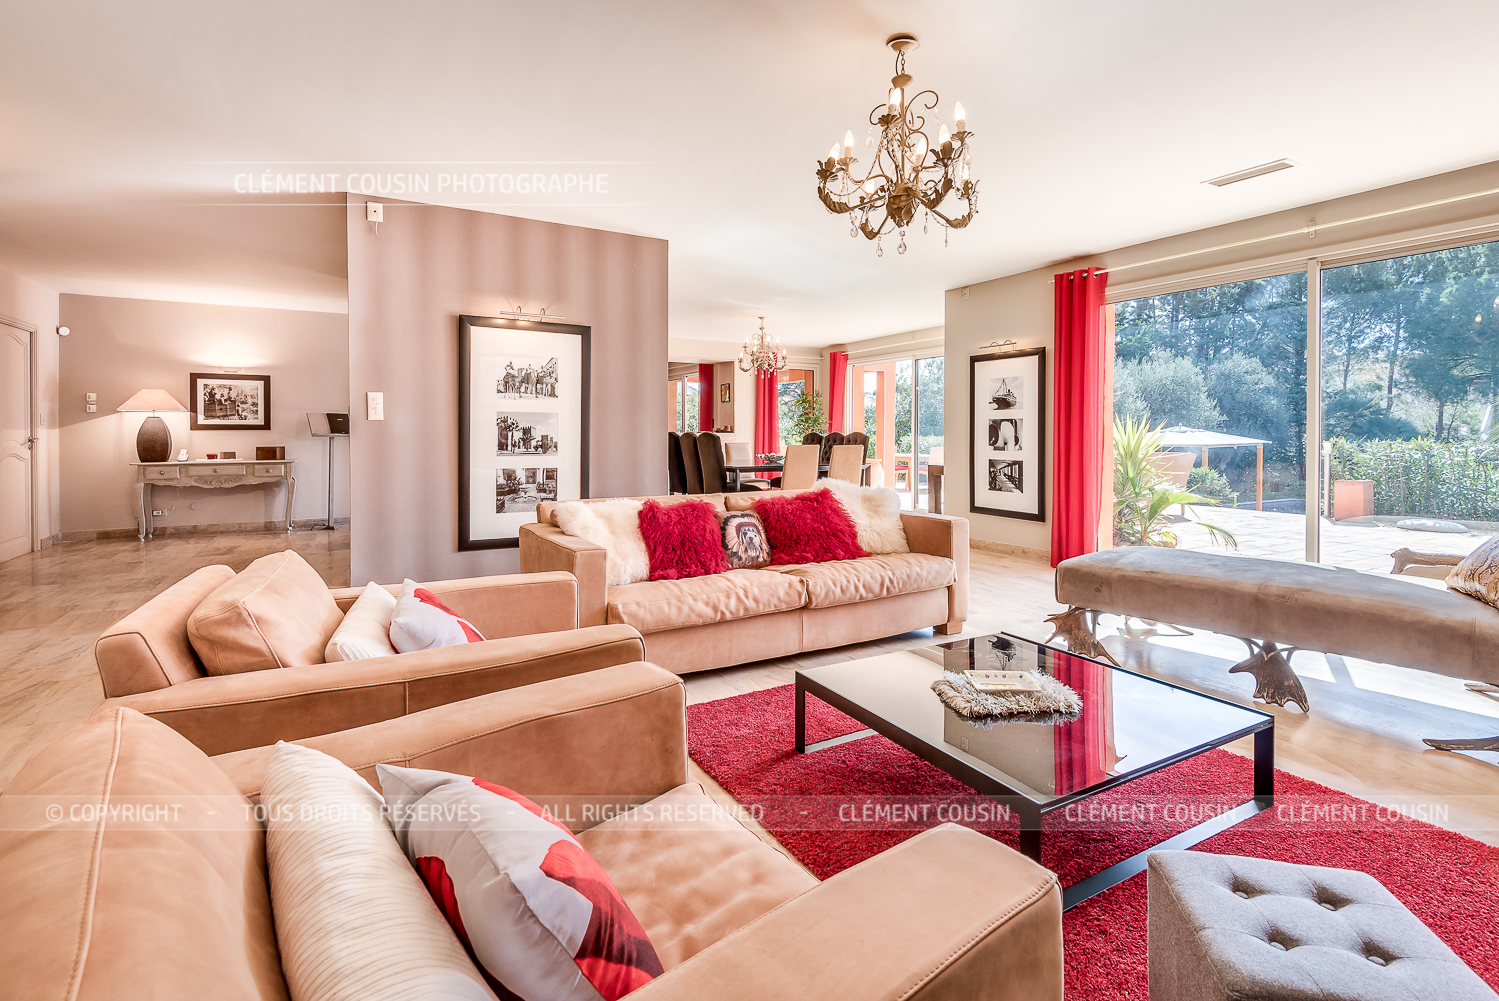 321 lux-clement cousin photographe-villa charme bord mer-8.jpg